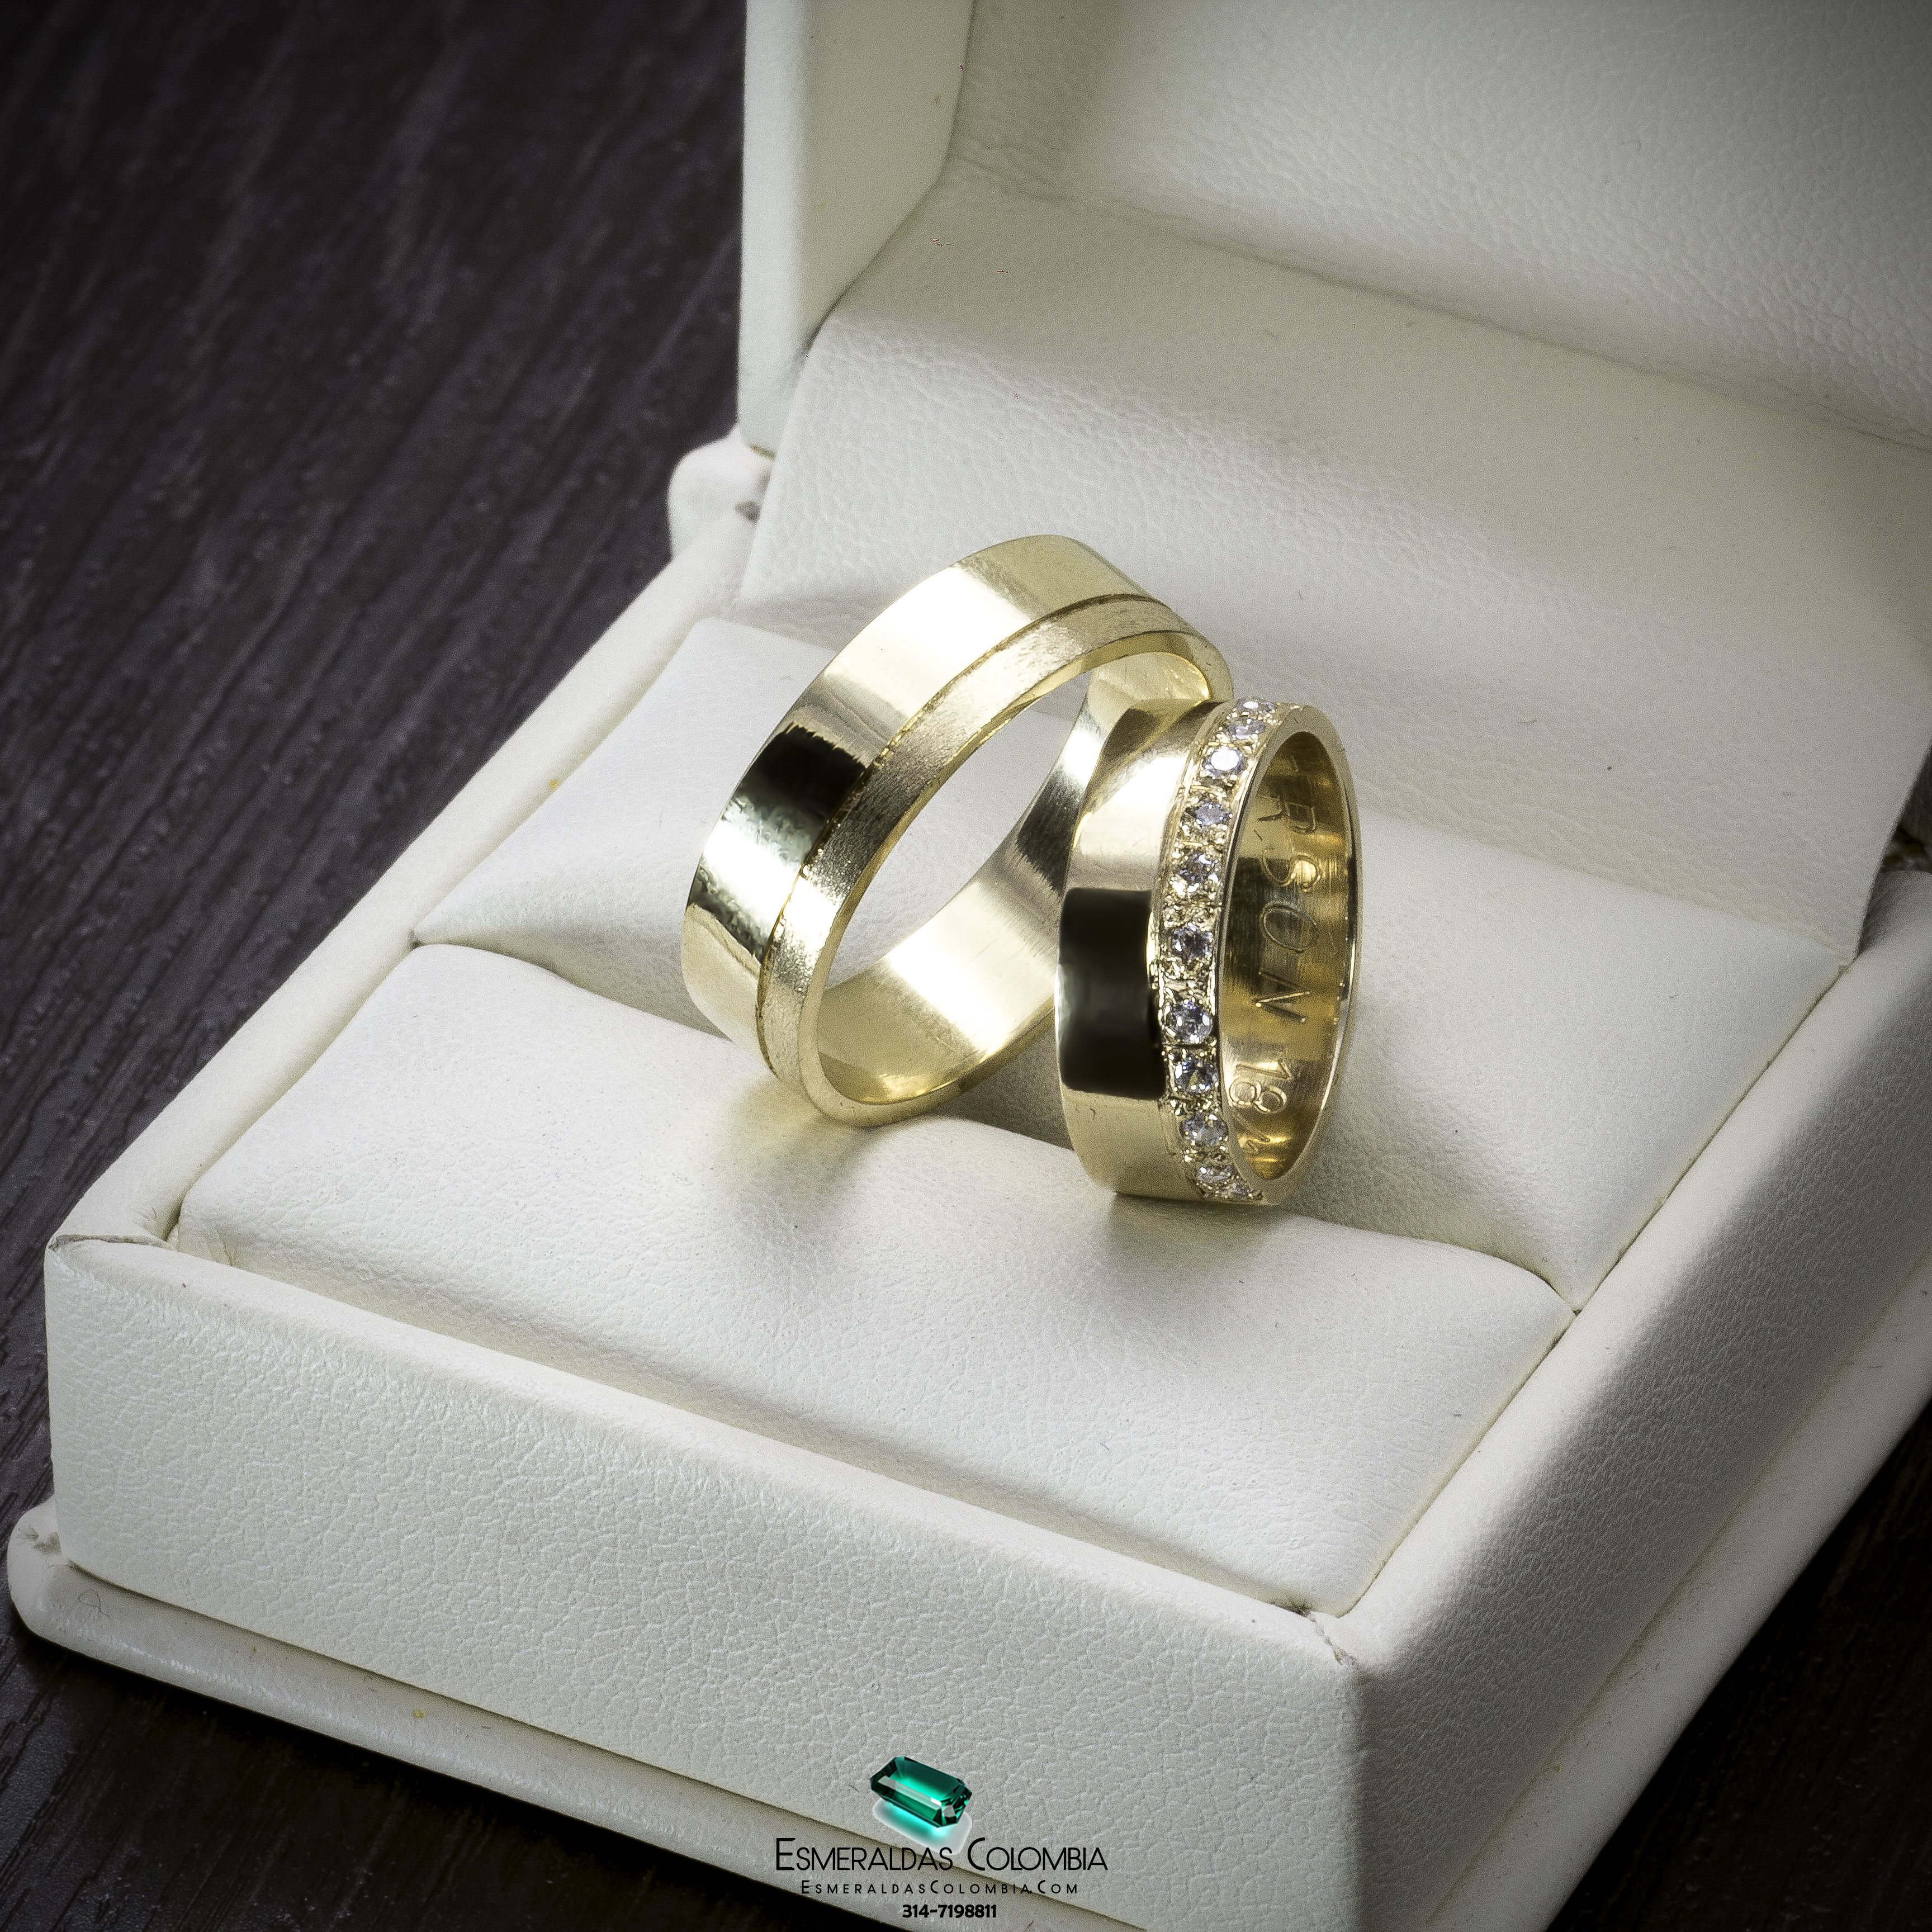 8993268b917c Argollas Matrimonio Boda Oro 18k O Plata Diamante Swaroski   esmeraldascolombia Facebook   esmeraldascolombia Instagram